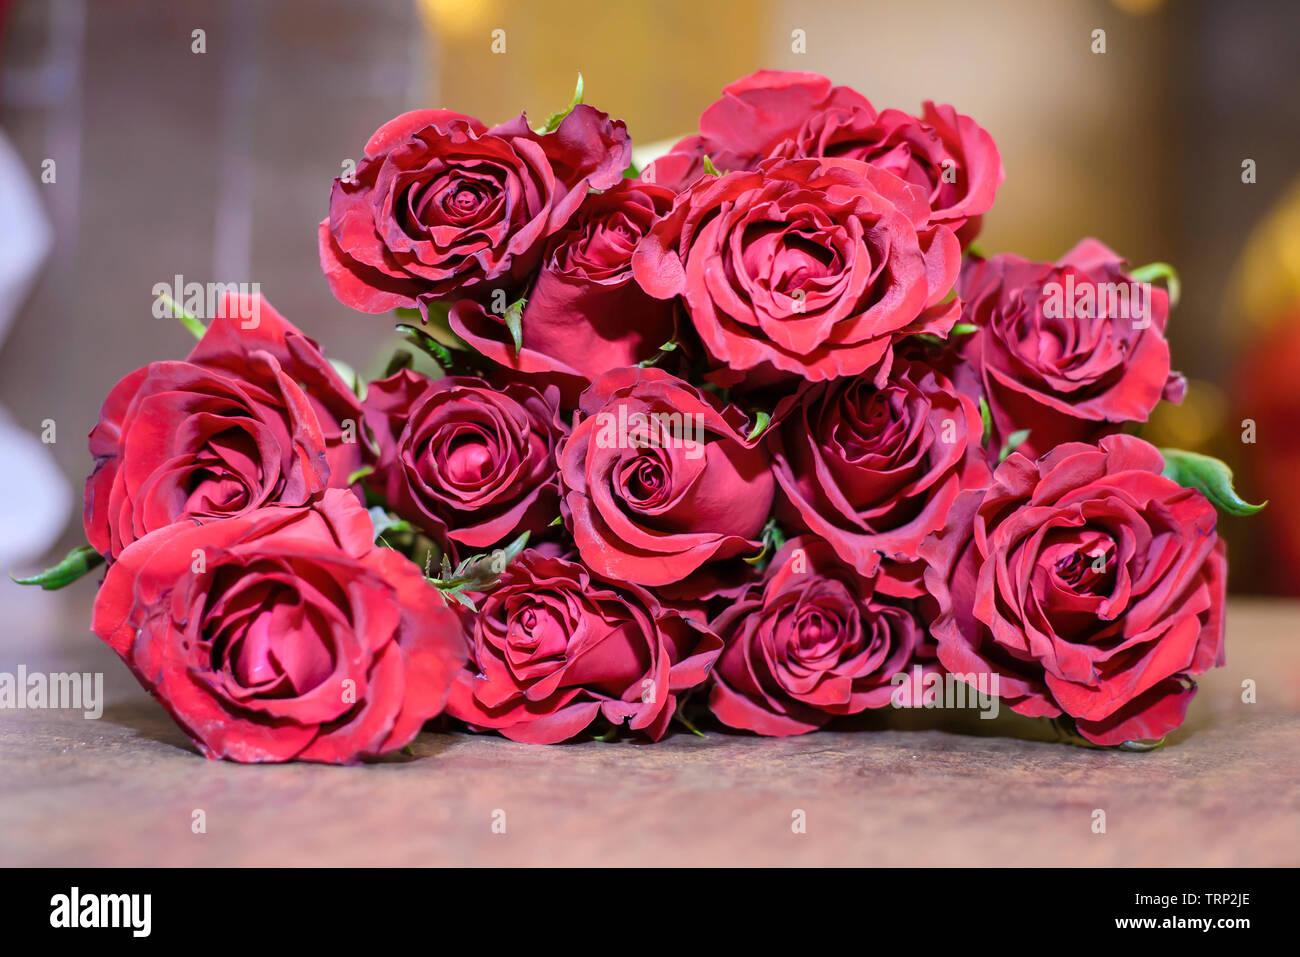 9b6df9a8dd4 Un ramo de rosas rojas brillantes acostado sobre una mesa de madera closeup  Imagen De Stock